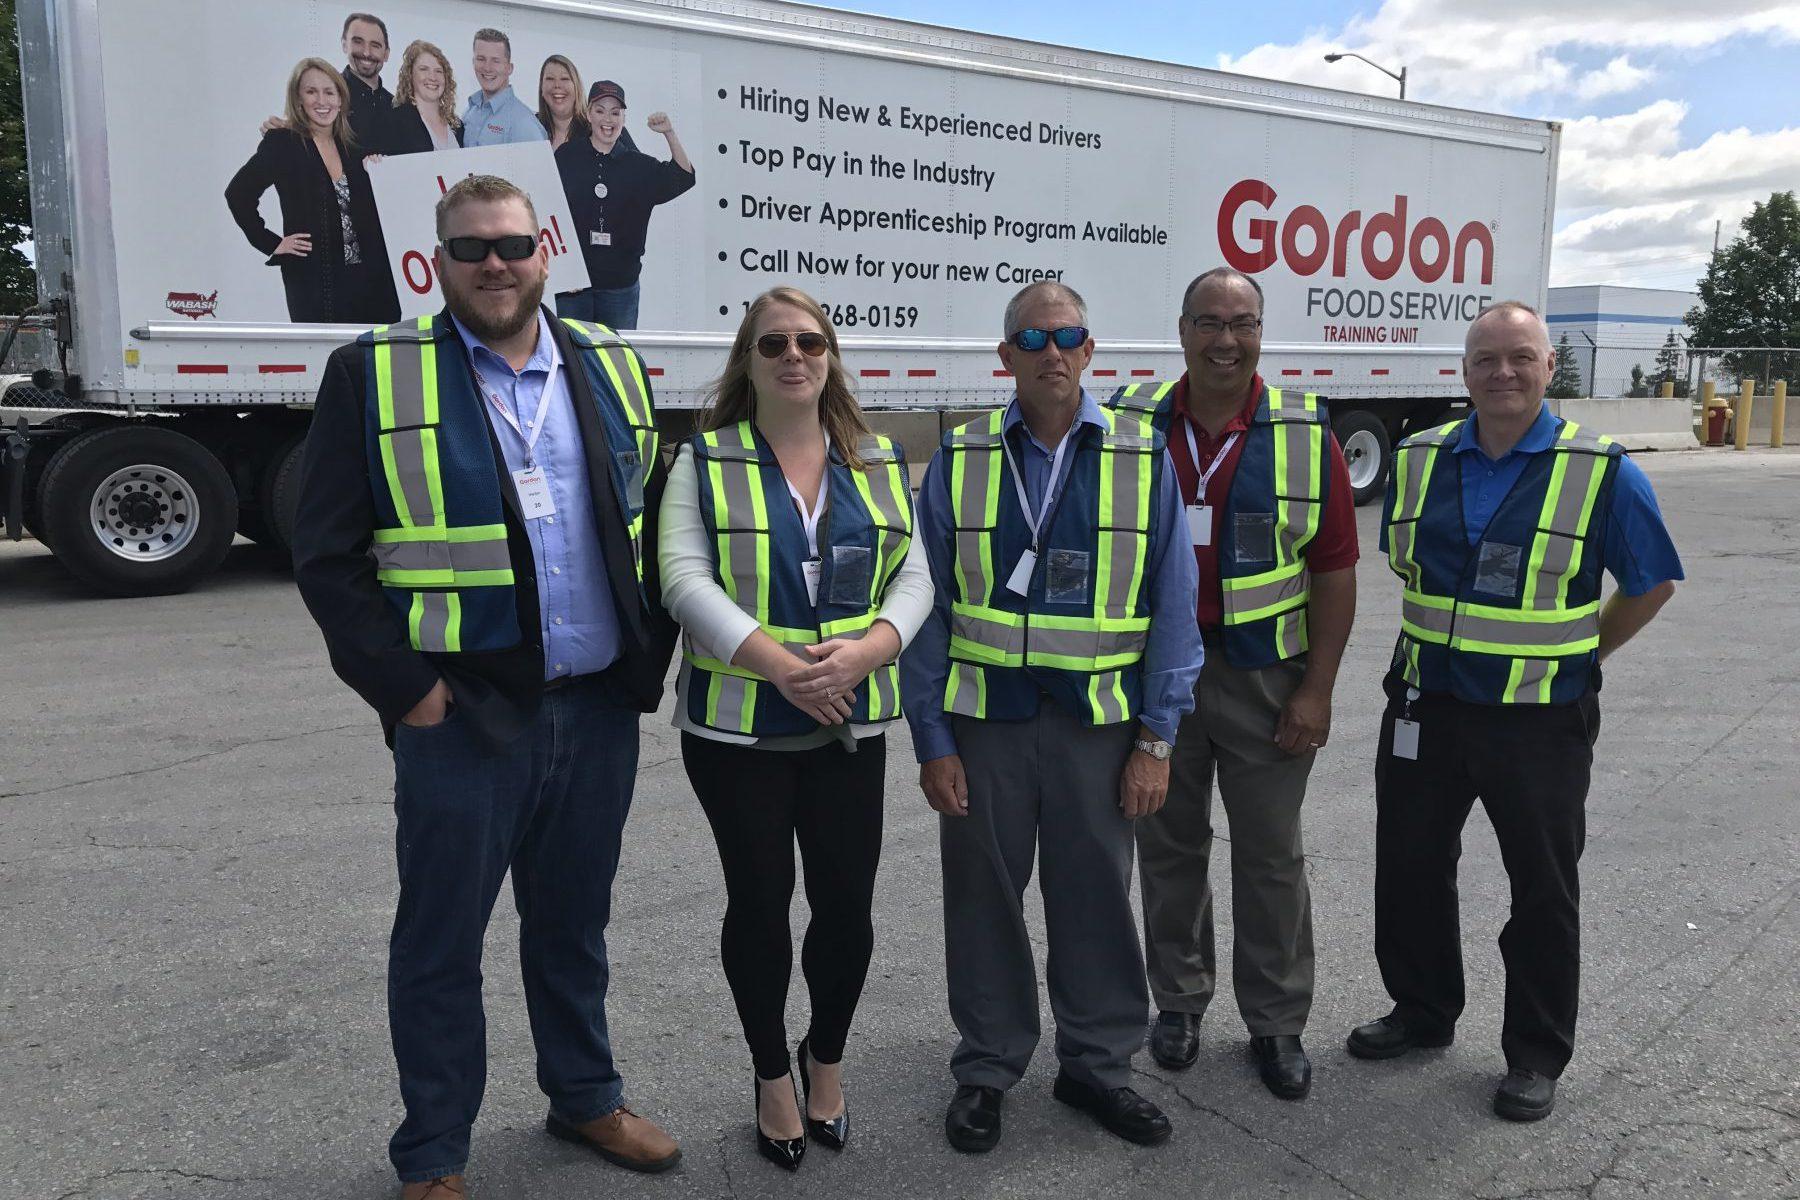 Gordon FOODS PMTC